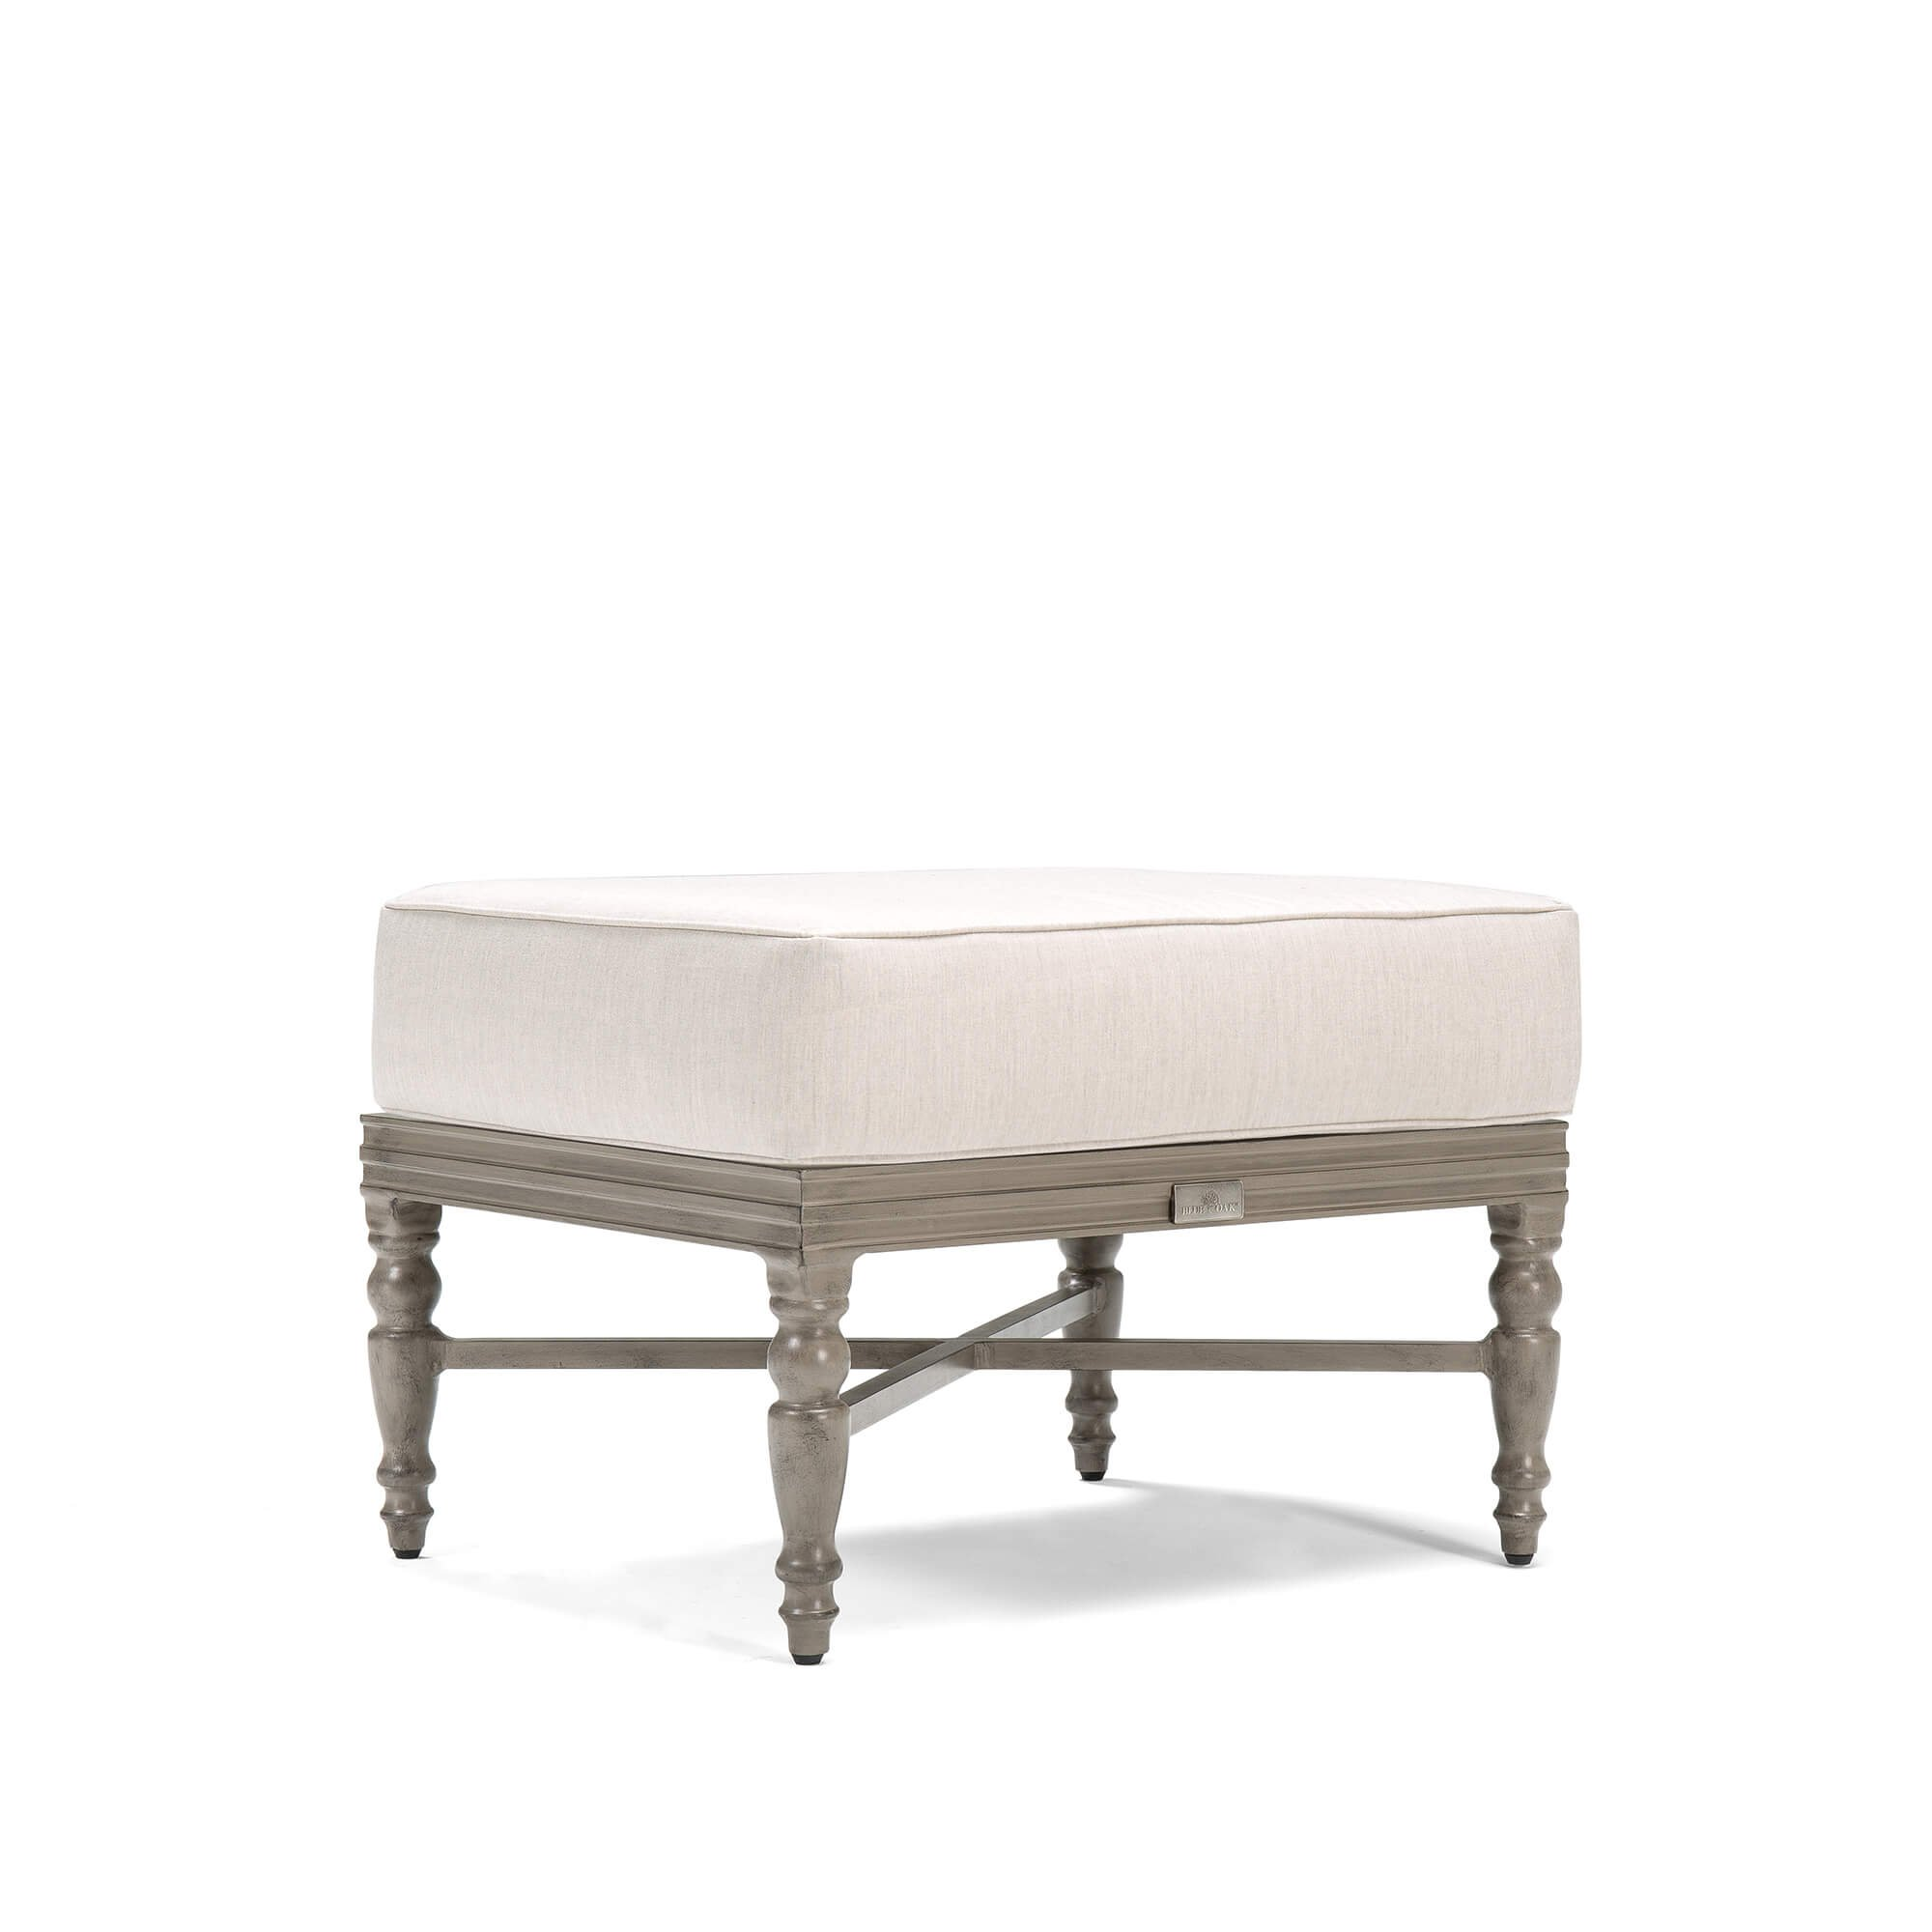 Blue Oak Outdoor Saylor Patio Furniture Ottoman with Outdura Remy Sand Cushion